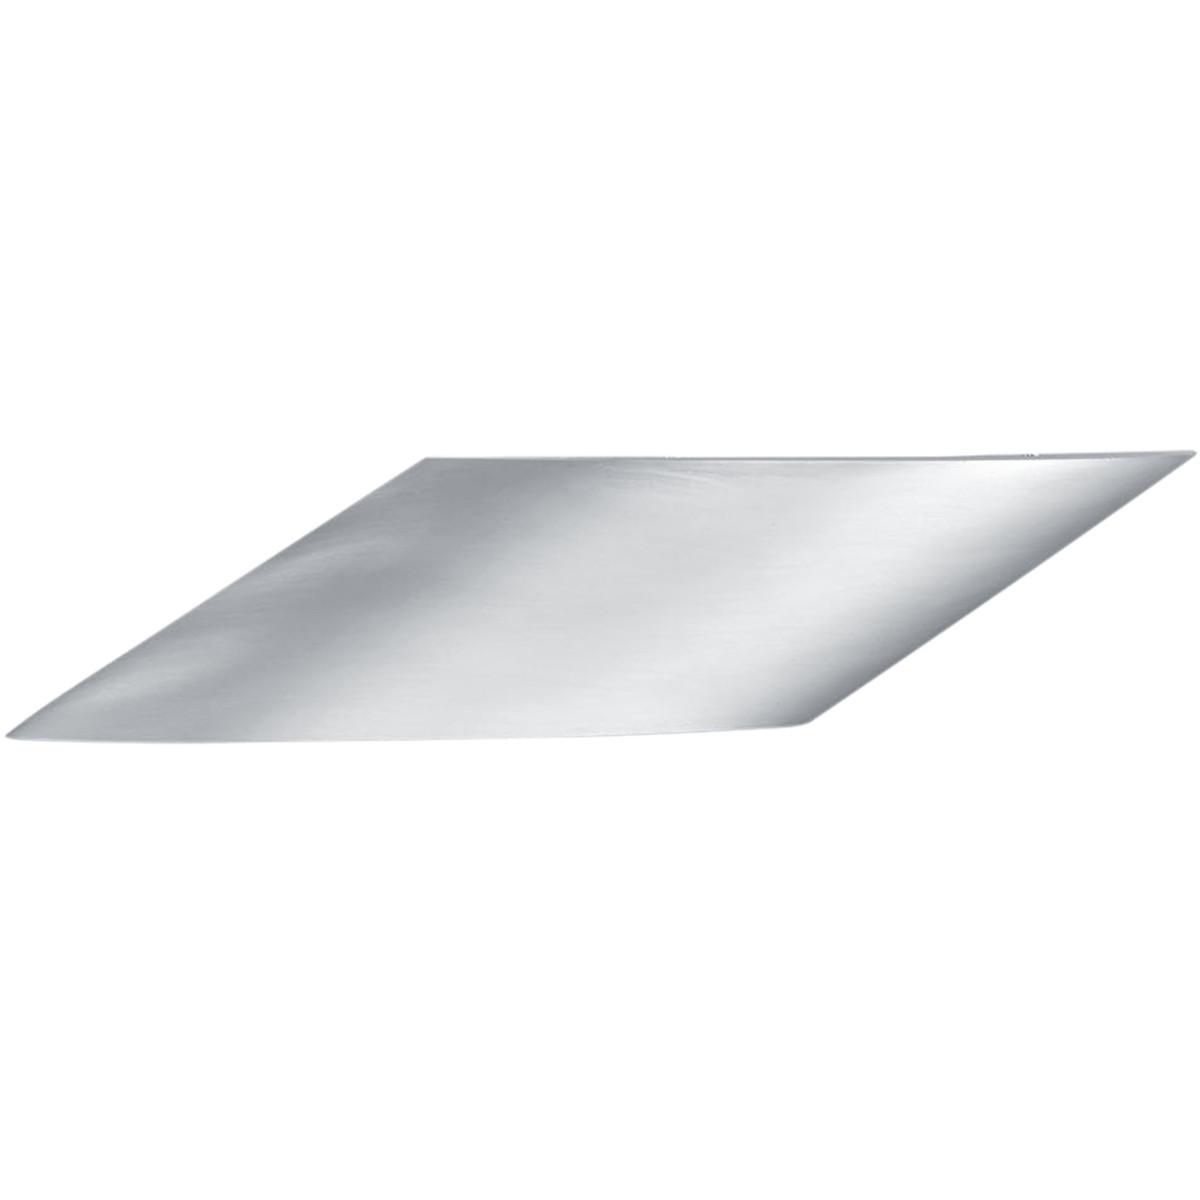 LED Wandlamp - Wandverlichting - Trion Exalin - 6W - Warm Wit 3000K - Rond - Mat Grijs - Aluminium